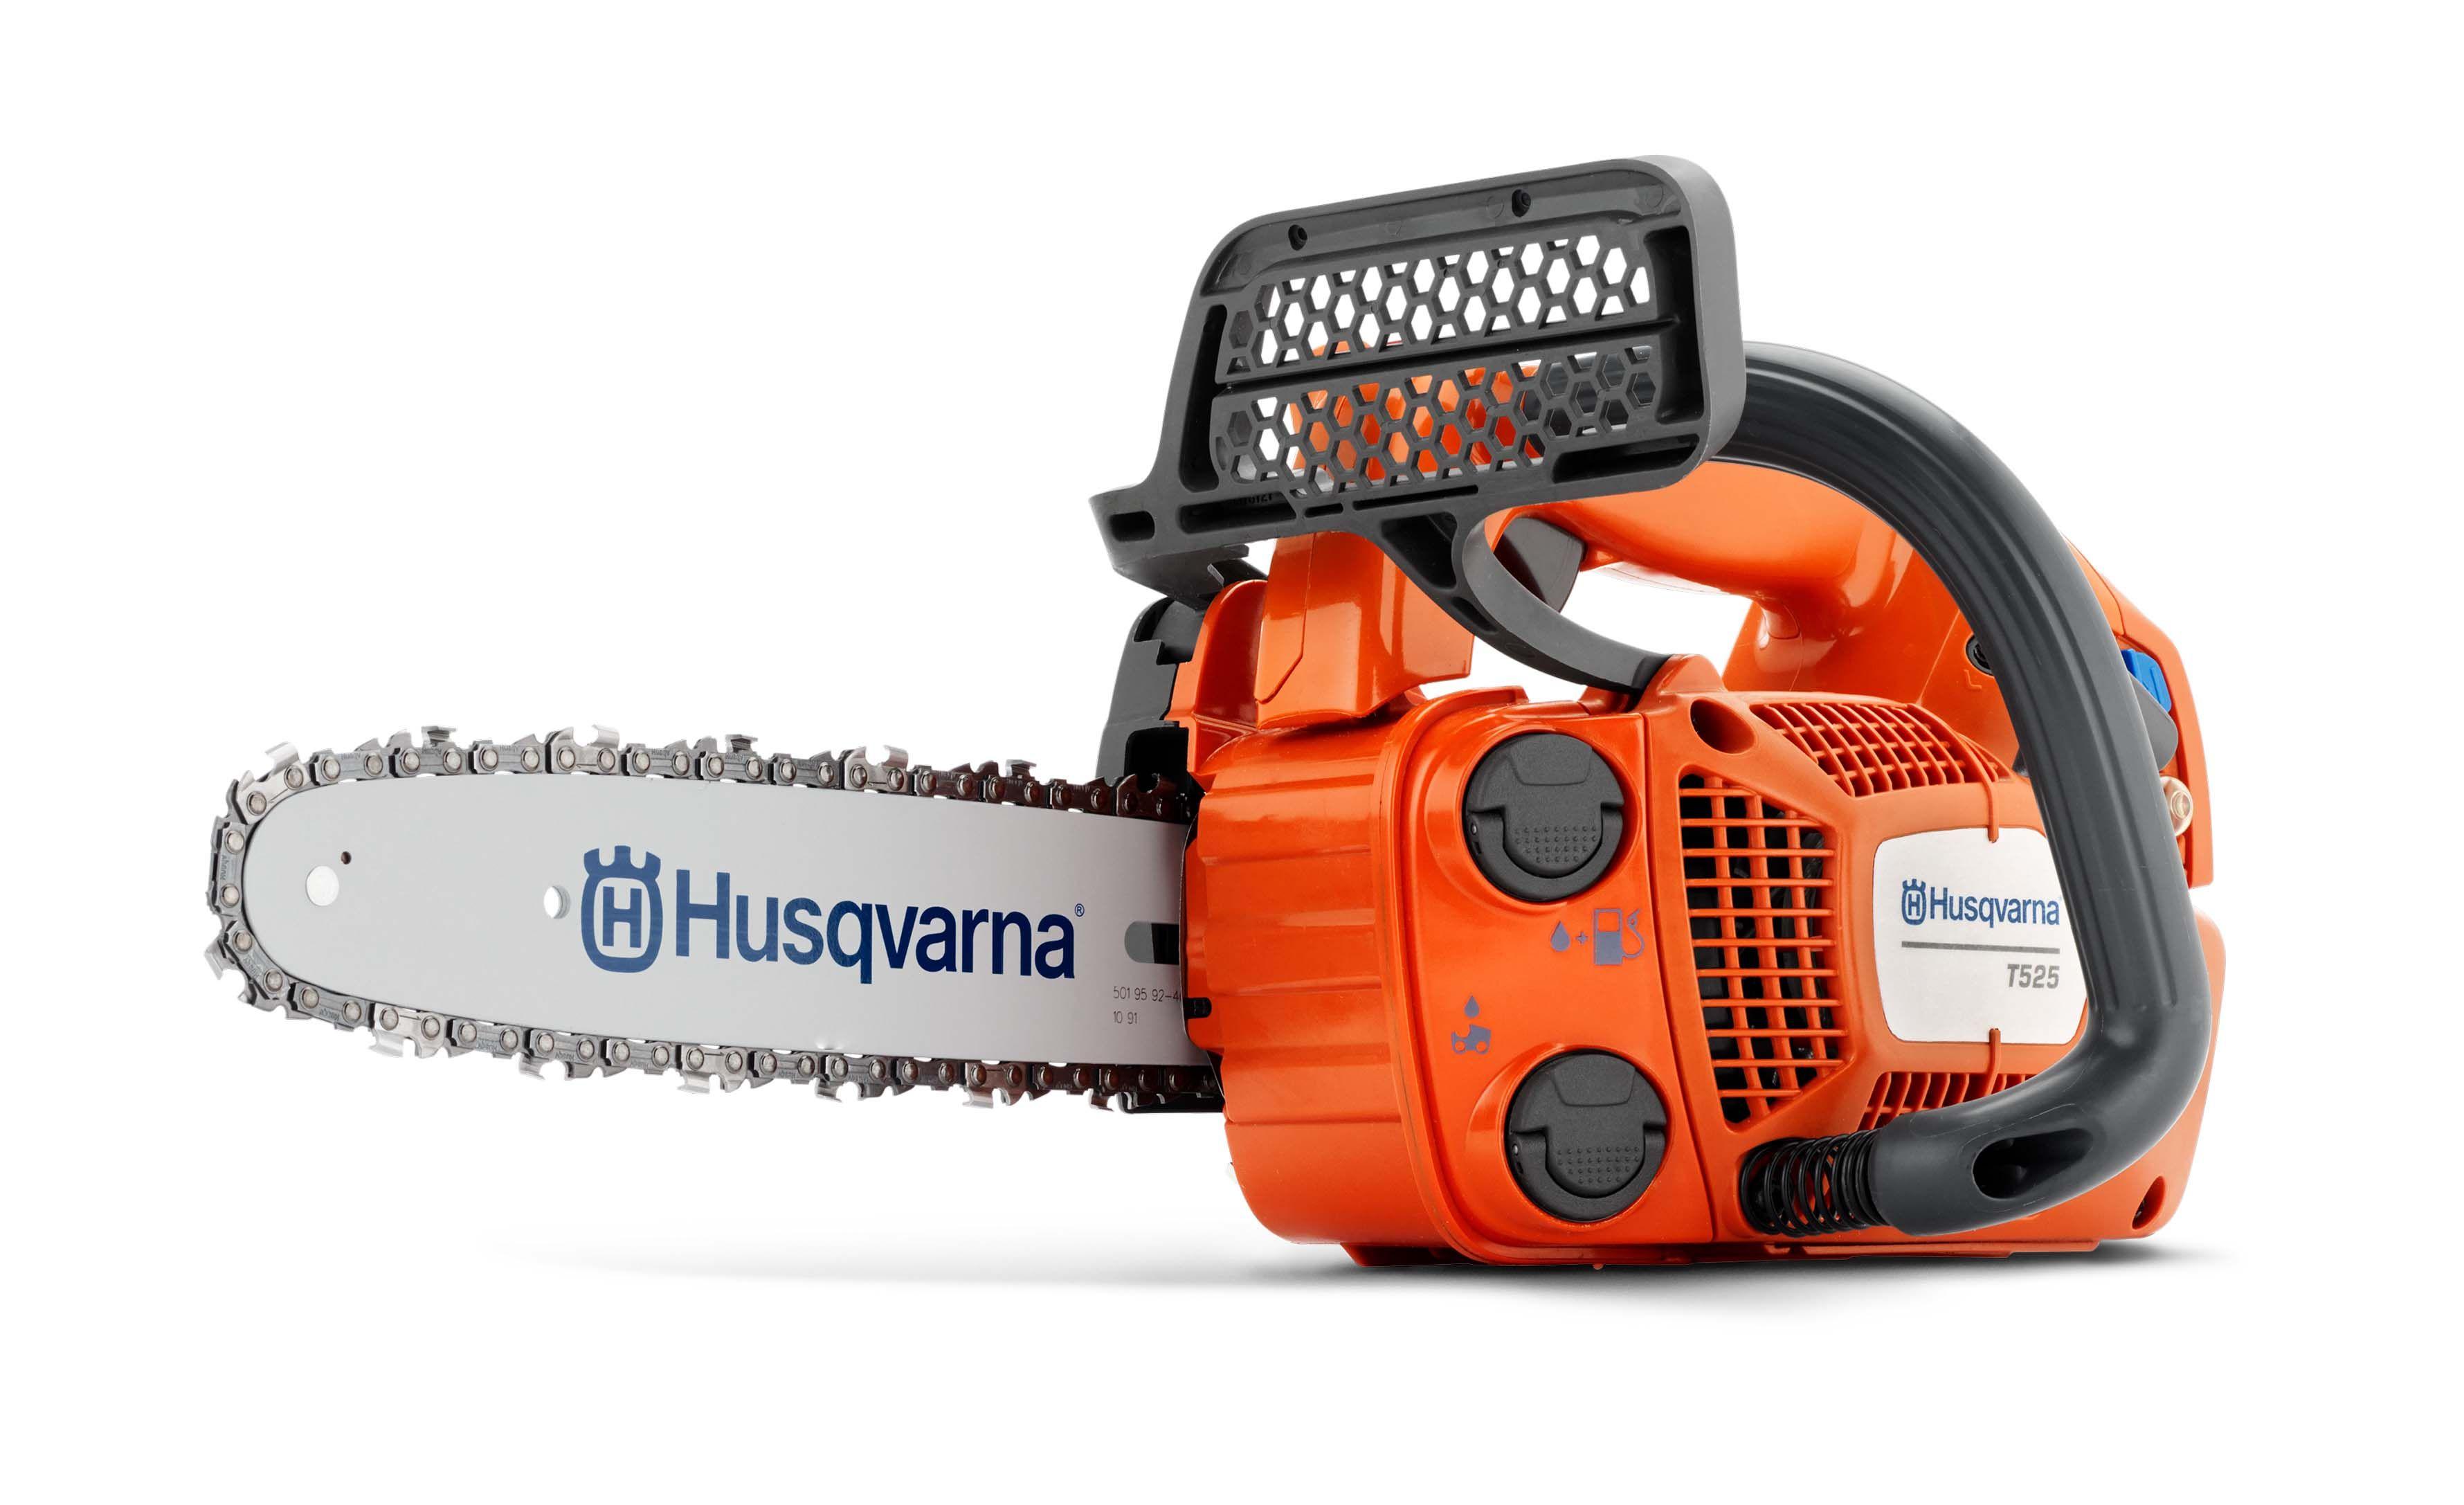 Husqvarna T525 27cc Top Handle Petrol Chain Saw 25cm